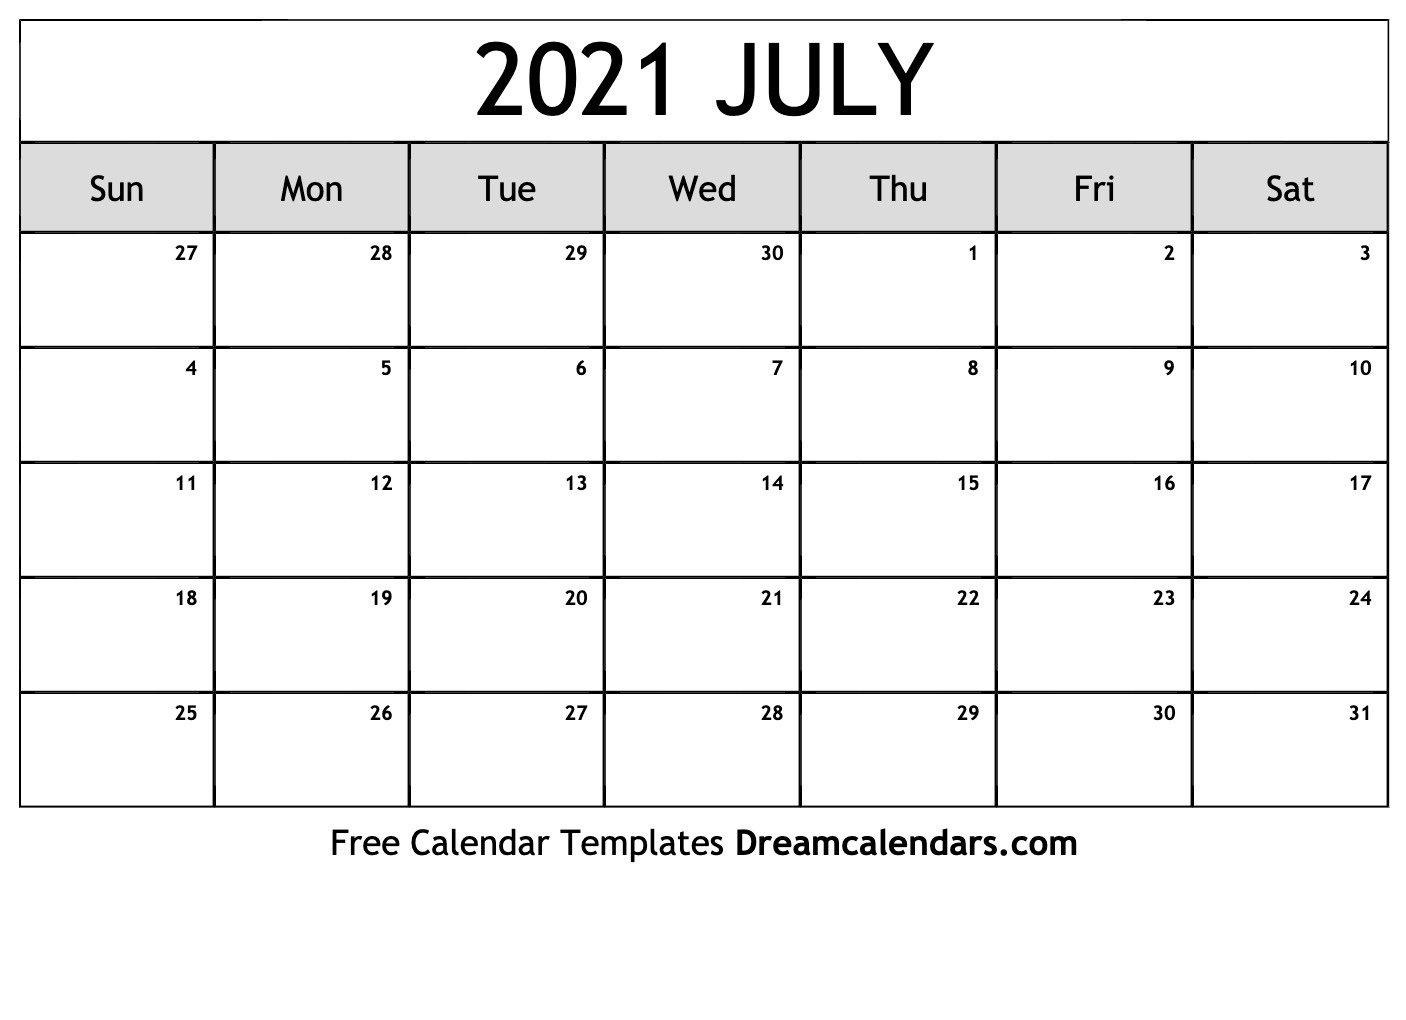 July 2021 Calendar   Free Blank Printable Templates Wiki Calendar August 2021